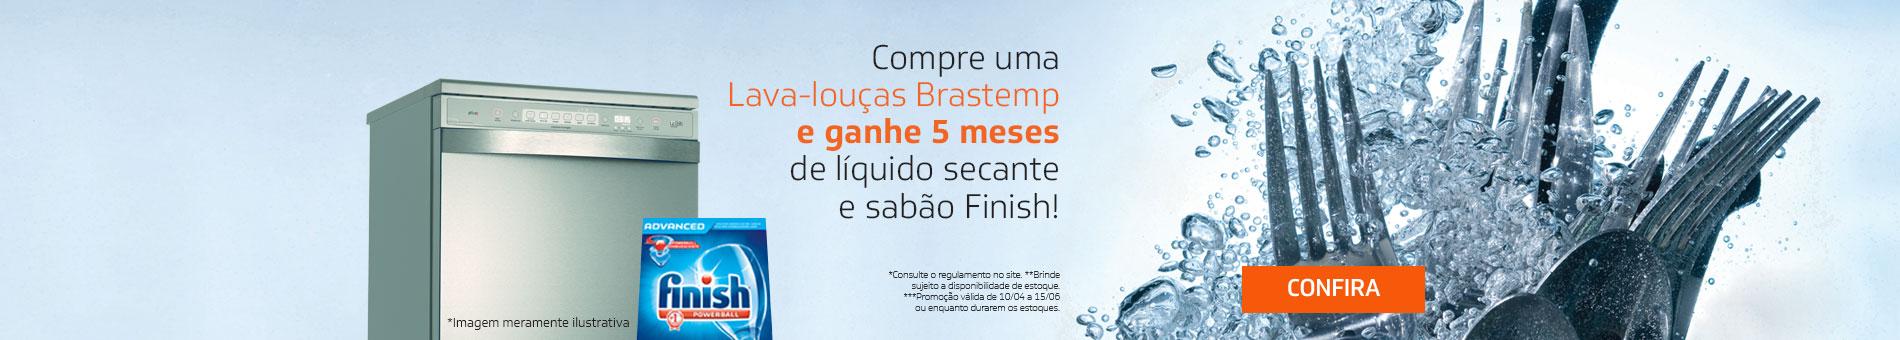 Promoção Interna - 1757 - brastemp_finish_26042017_home7 - finish - 7